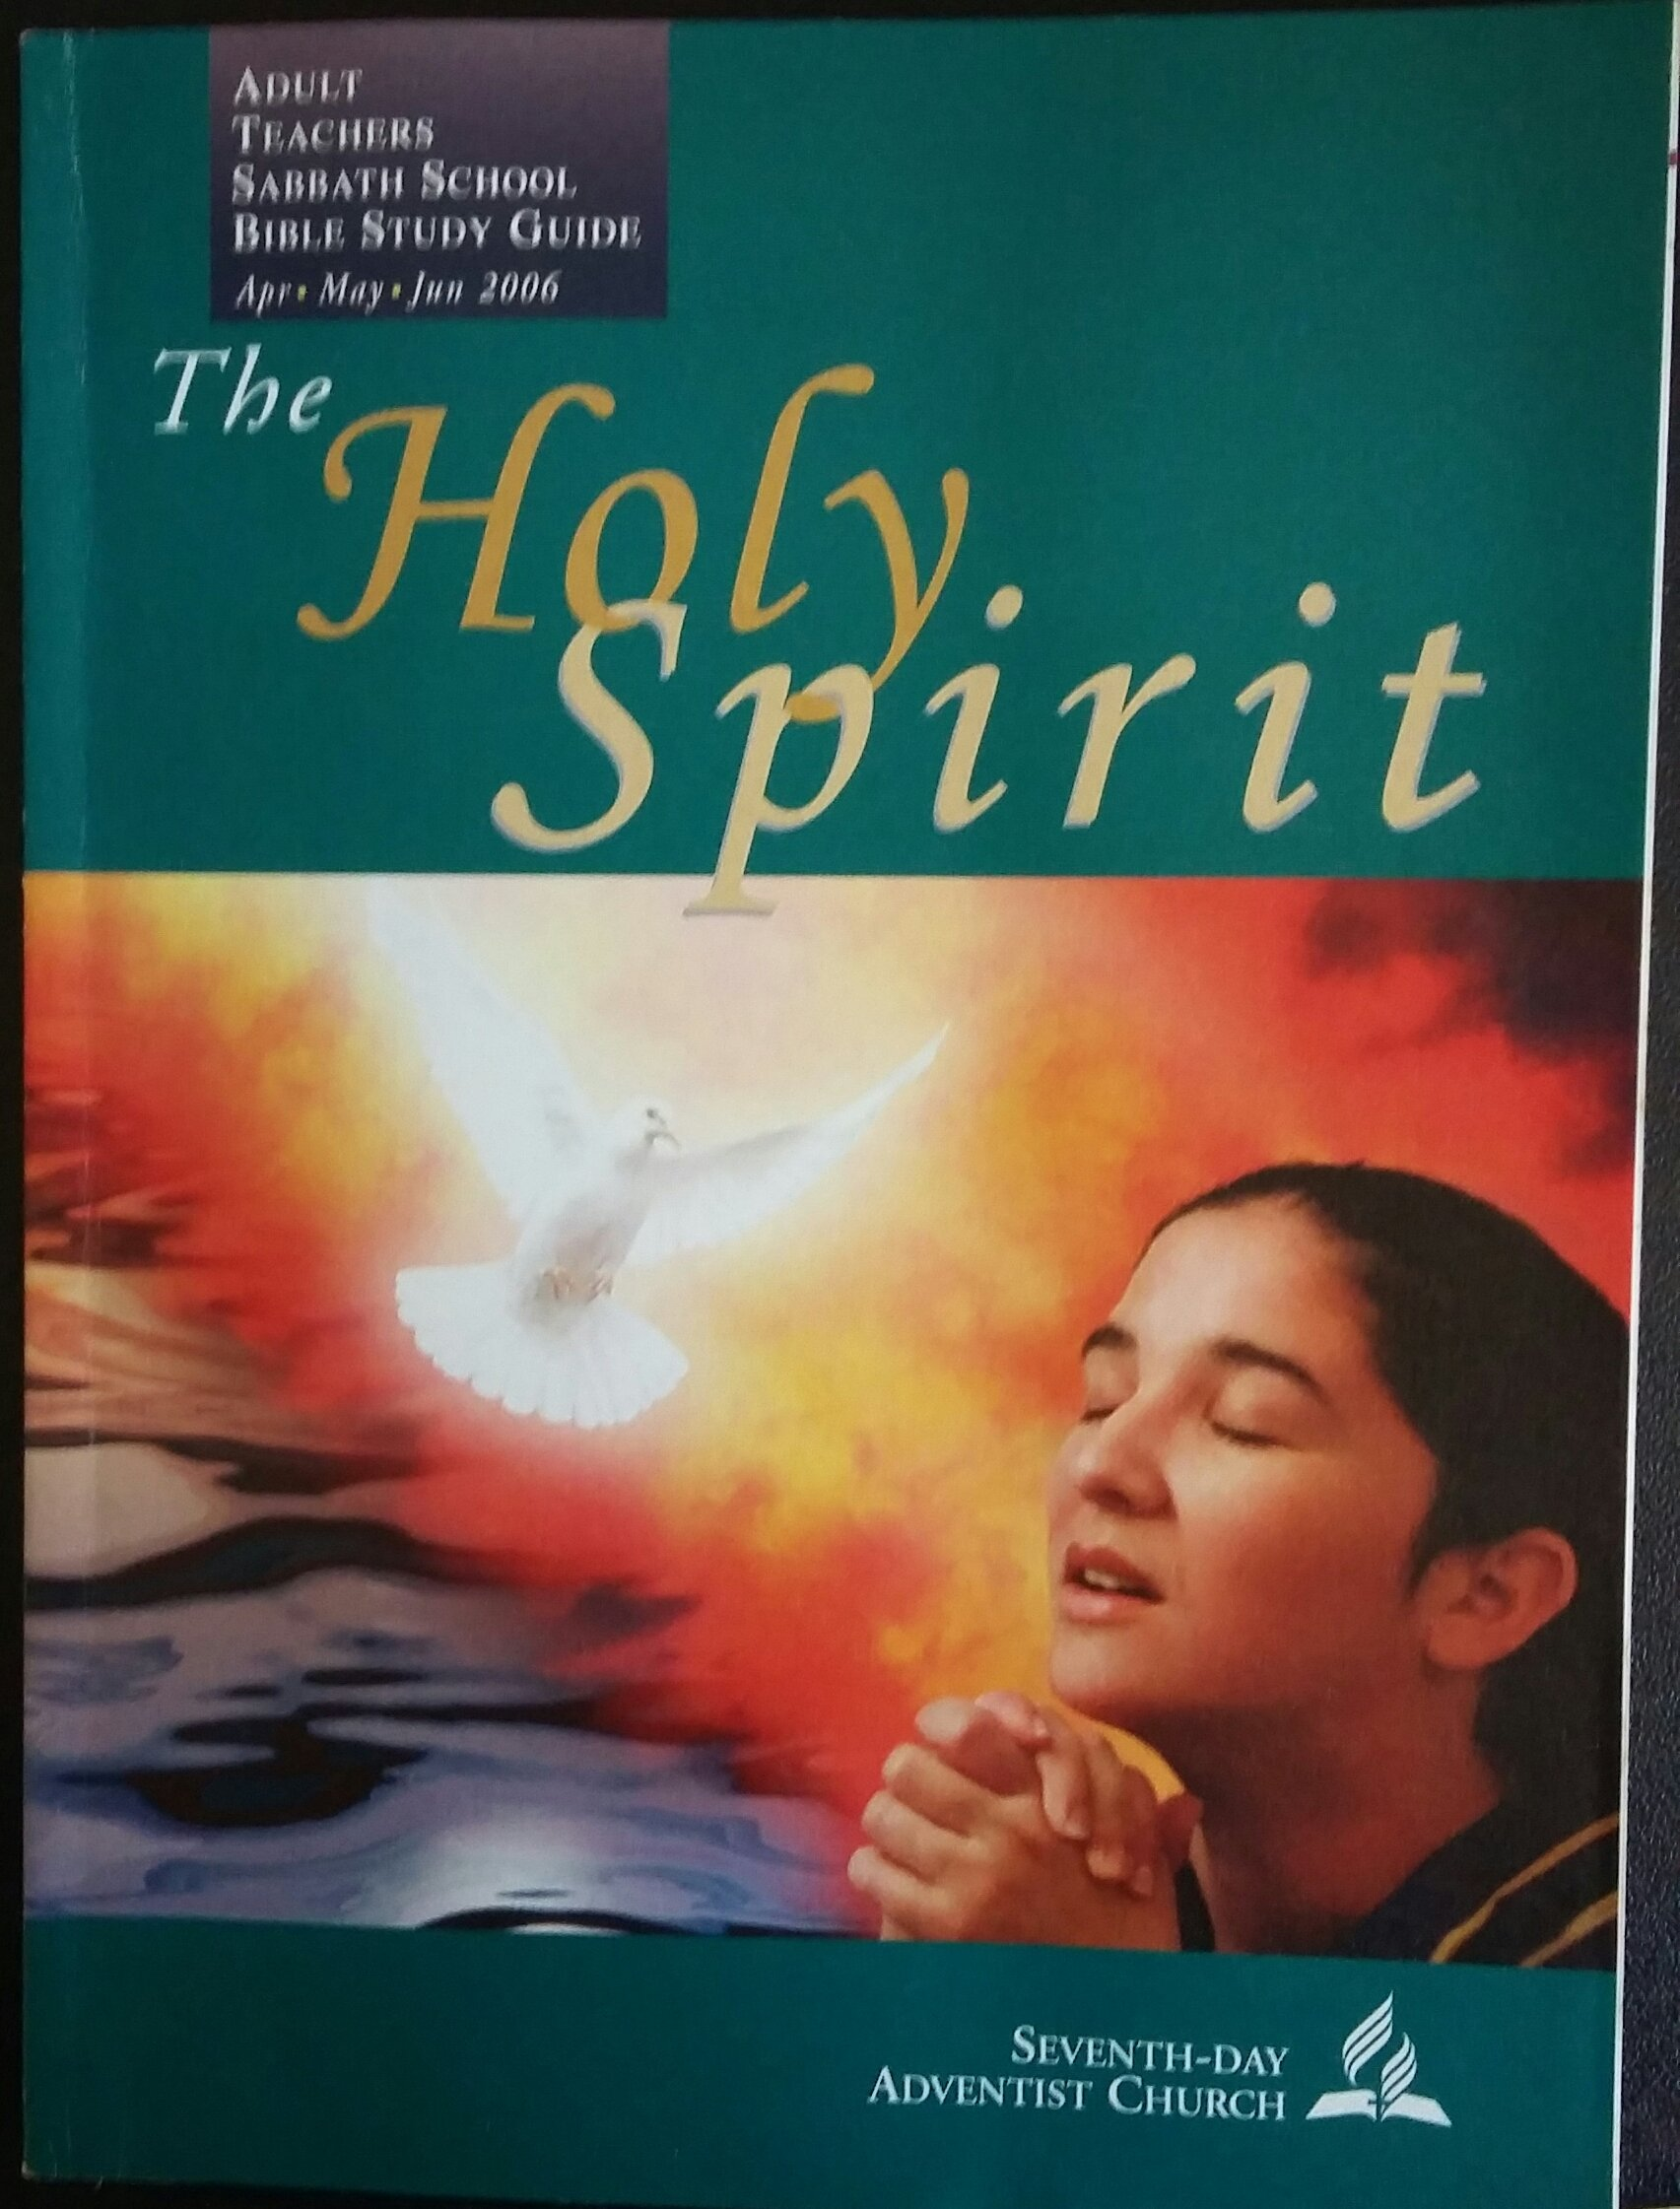 The Holy Spirit, Adult Teachers Sabbath School Bible Study